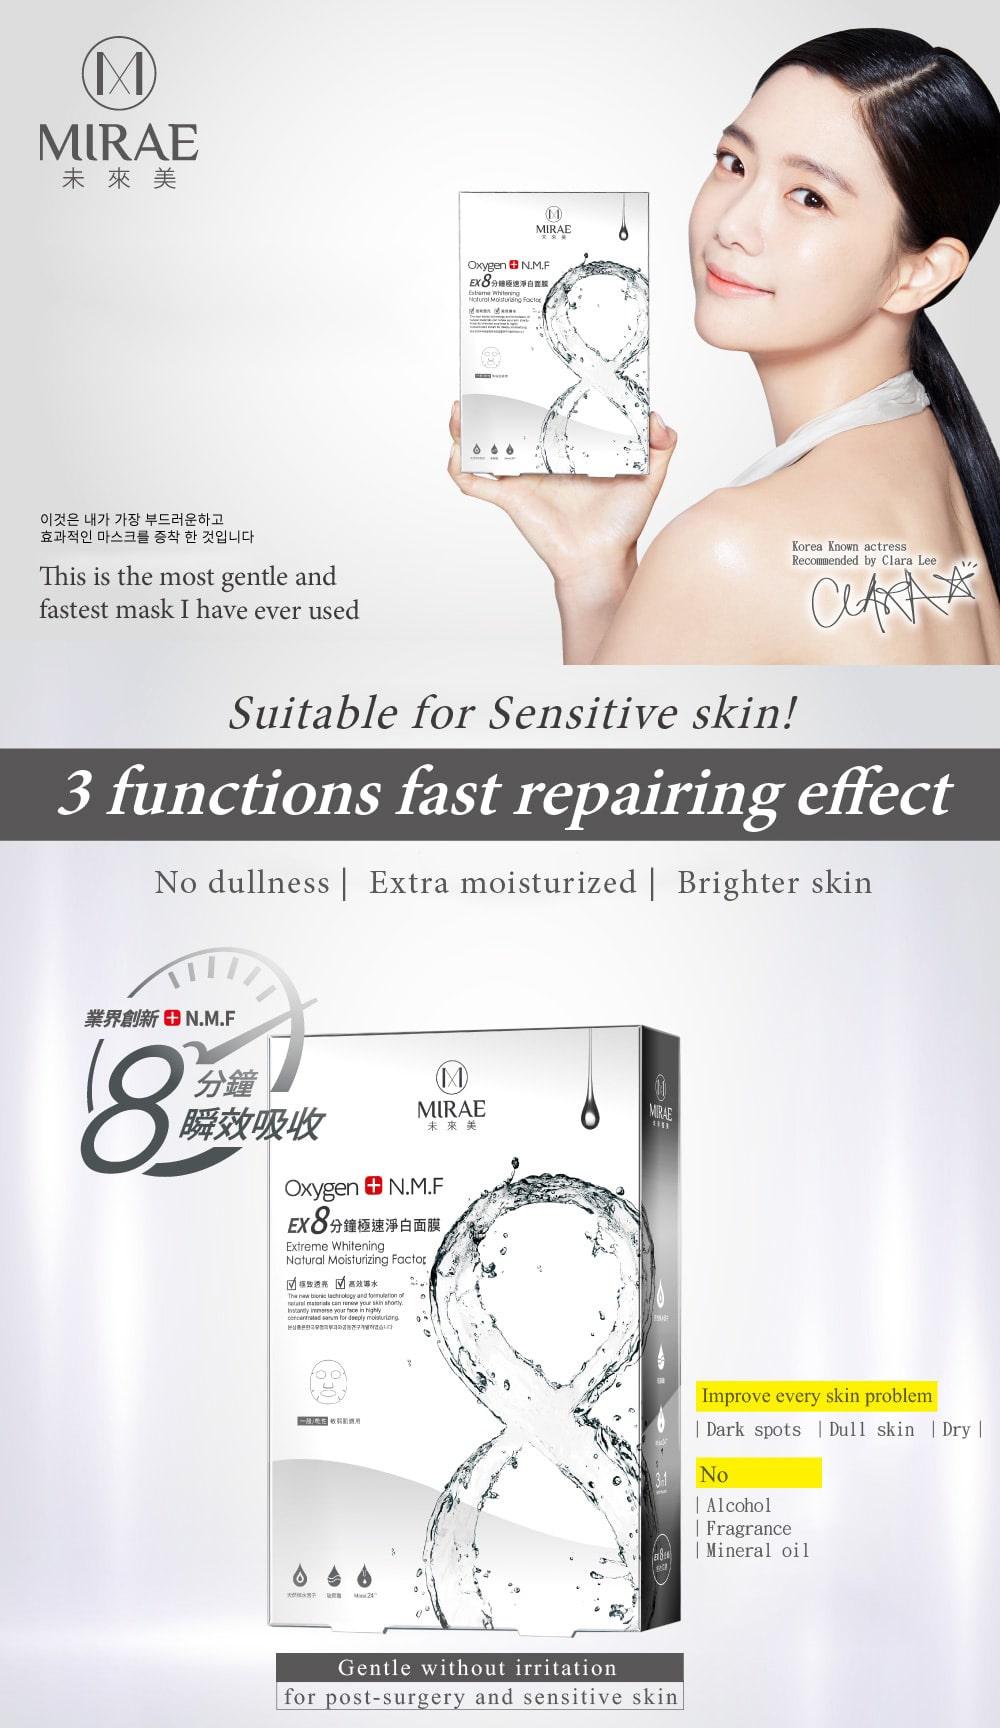 EX8-Minutes Whitening Mask - Intro